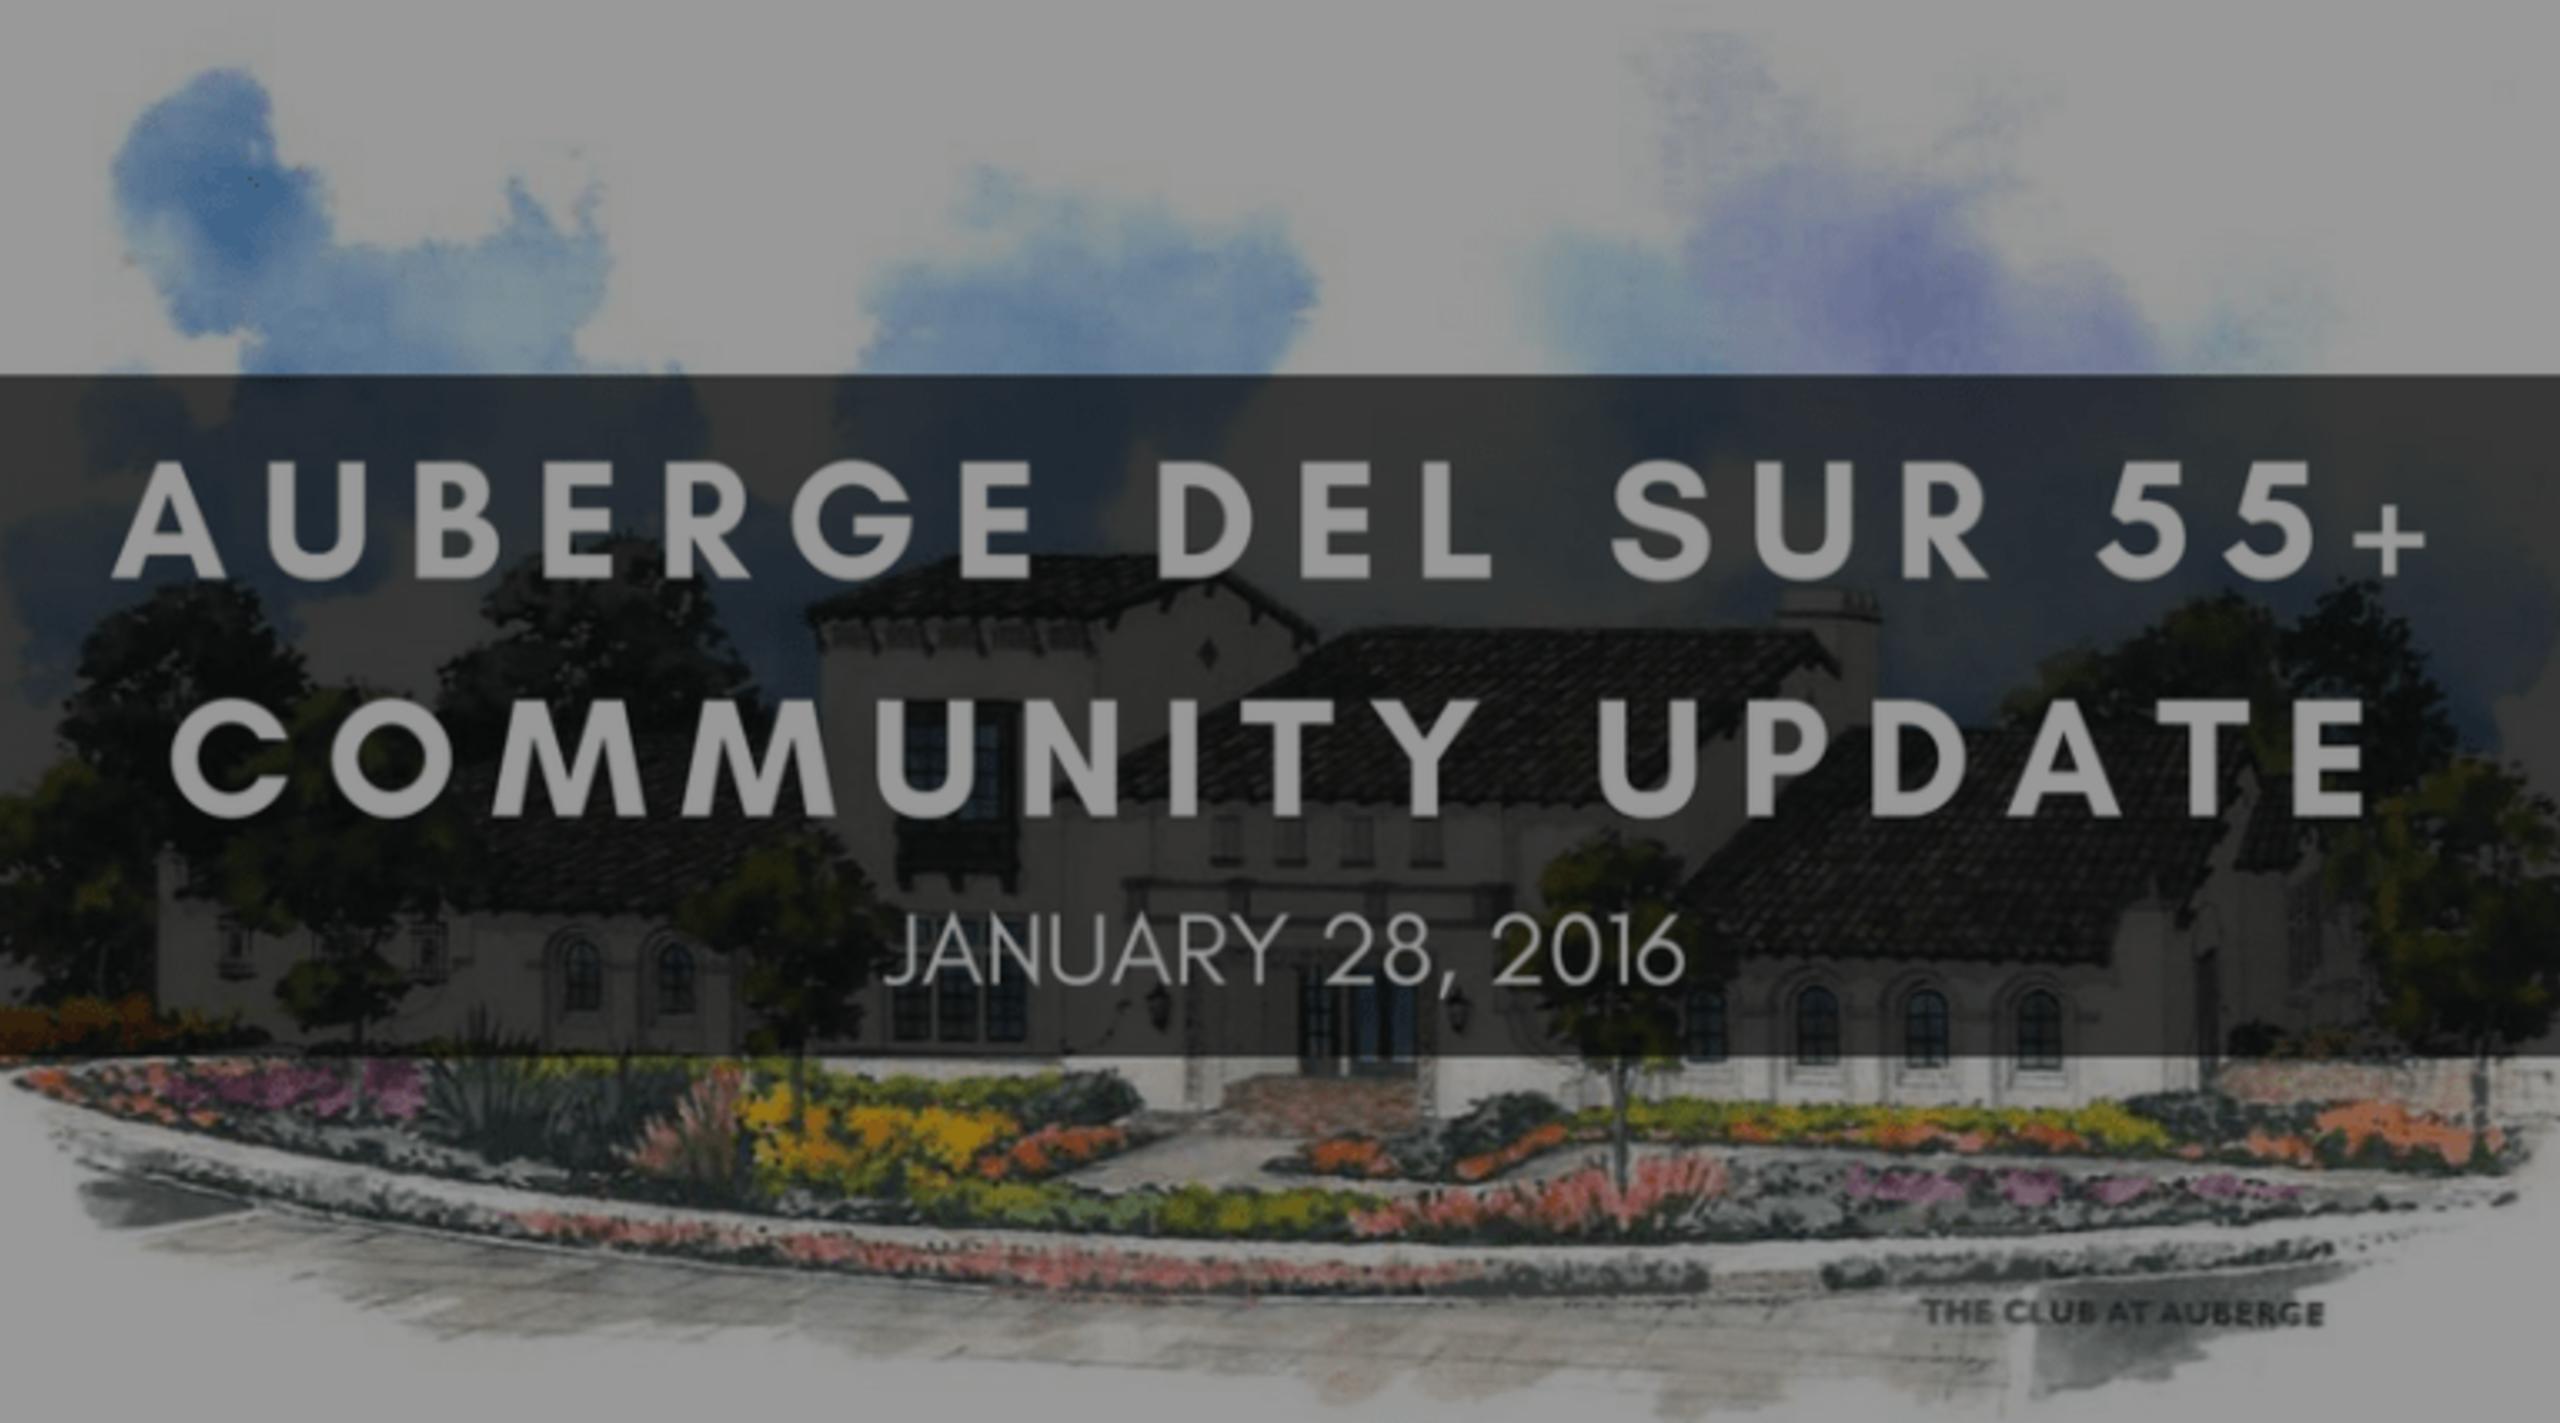 AUBERGE DEL SUR 55+ COMMUNITY UPDATE | JANUARY 28, 2016